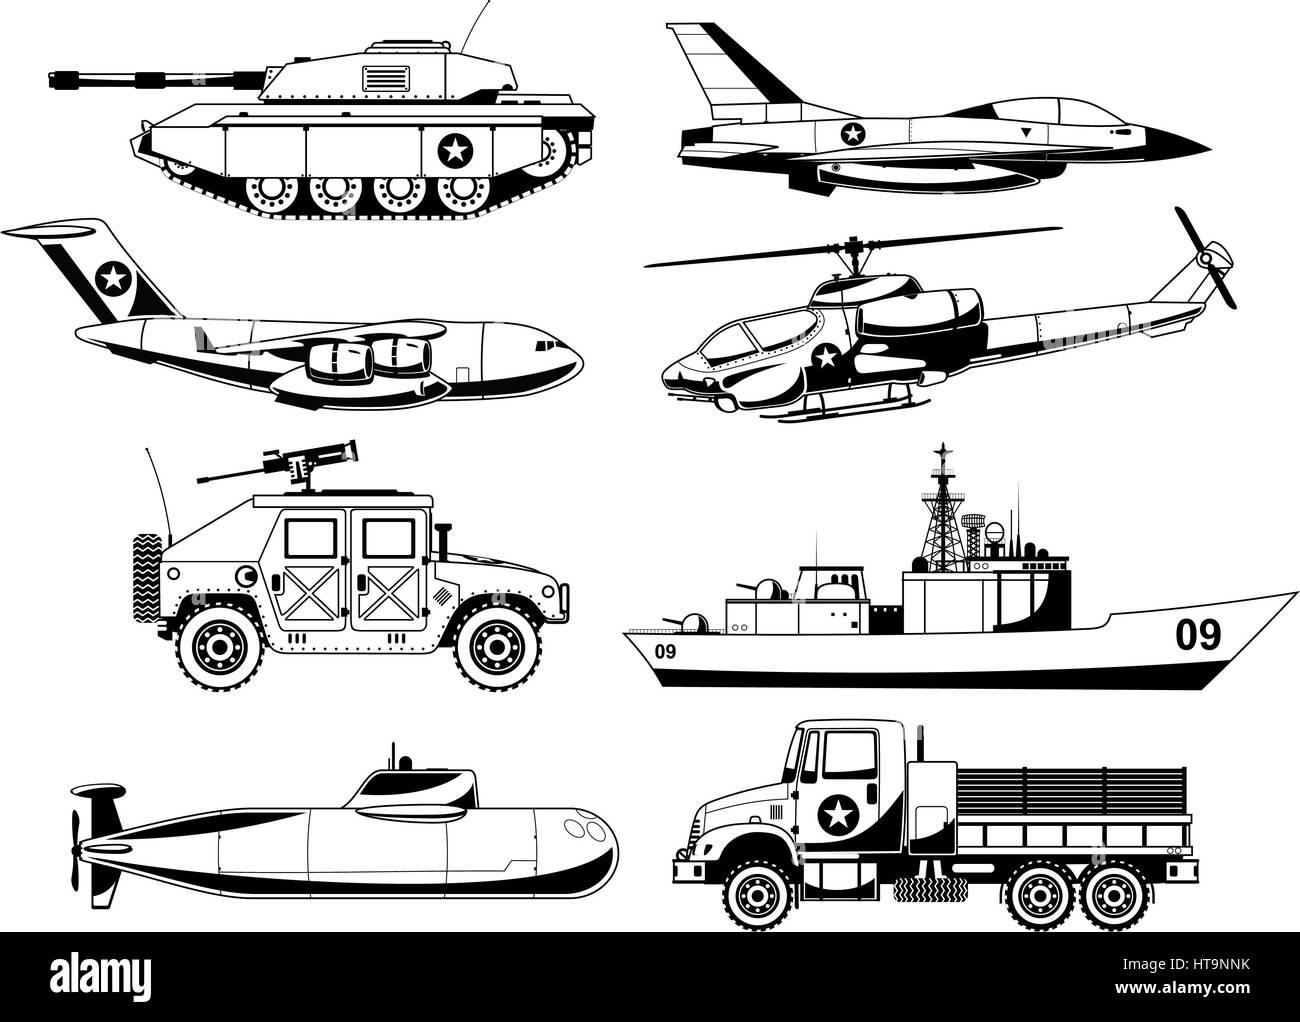 War Military Vehicles Vector Illustration. - Stock Image